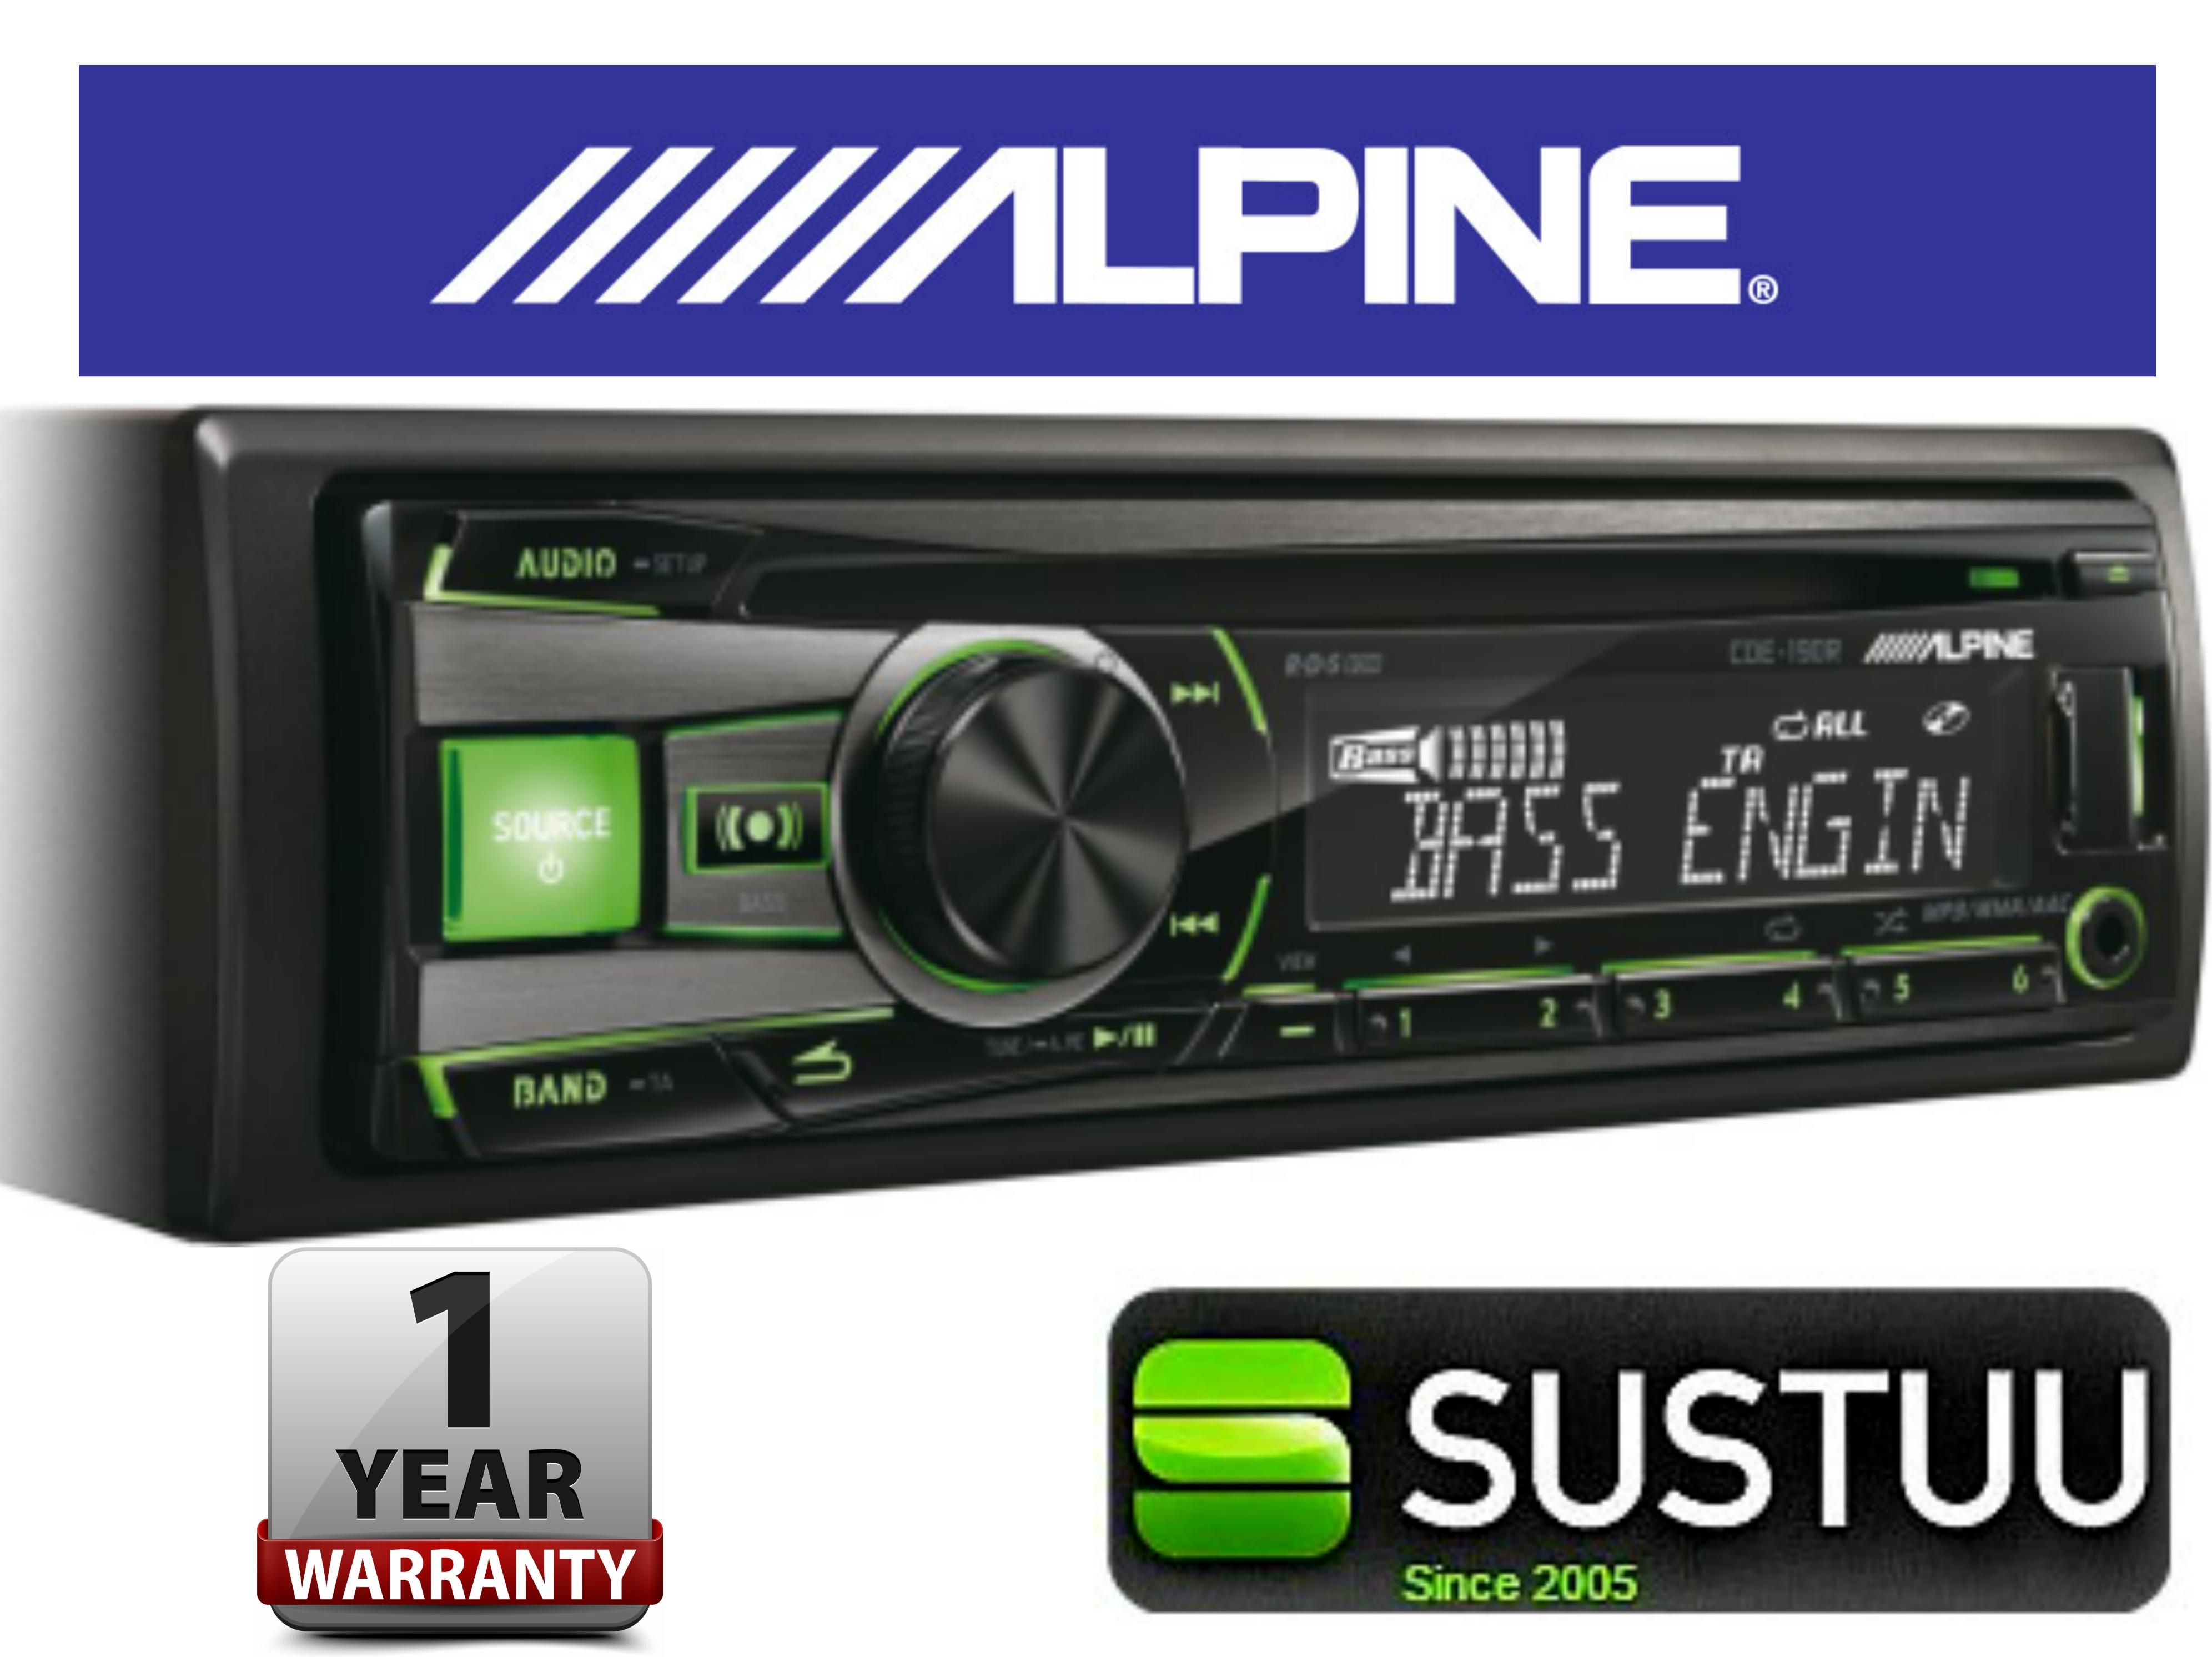 Genuine Alpine CDE 190R Car Media Receiver autoradio CD/USB 2 rca out-display